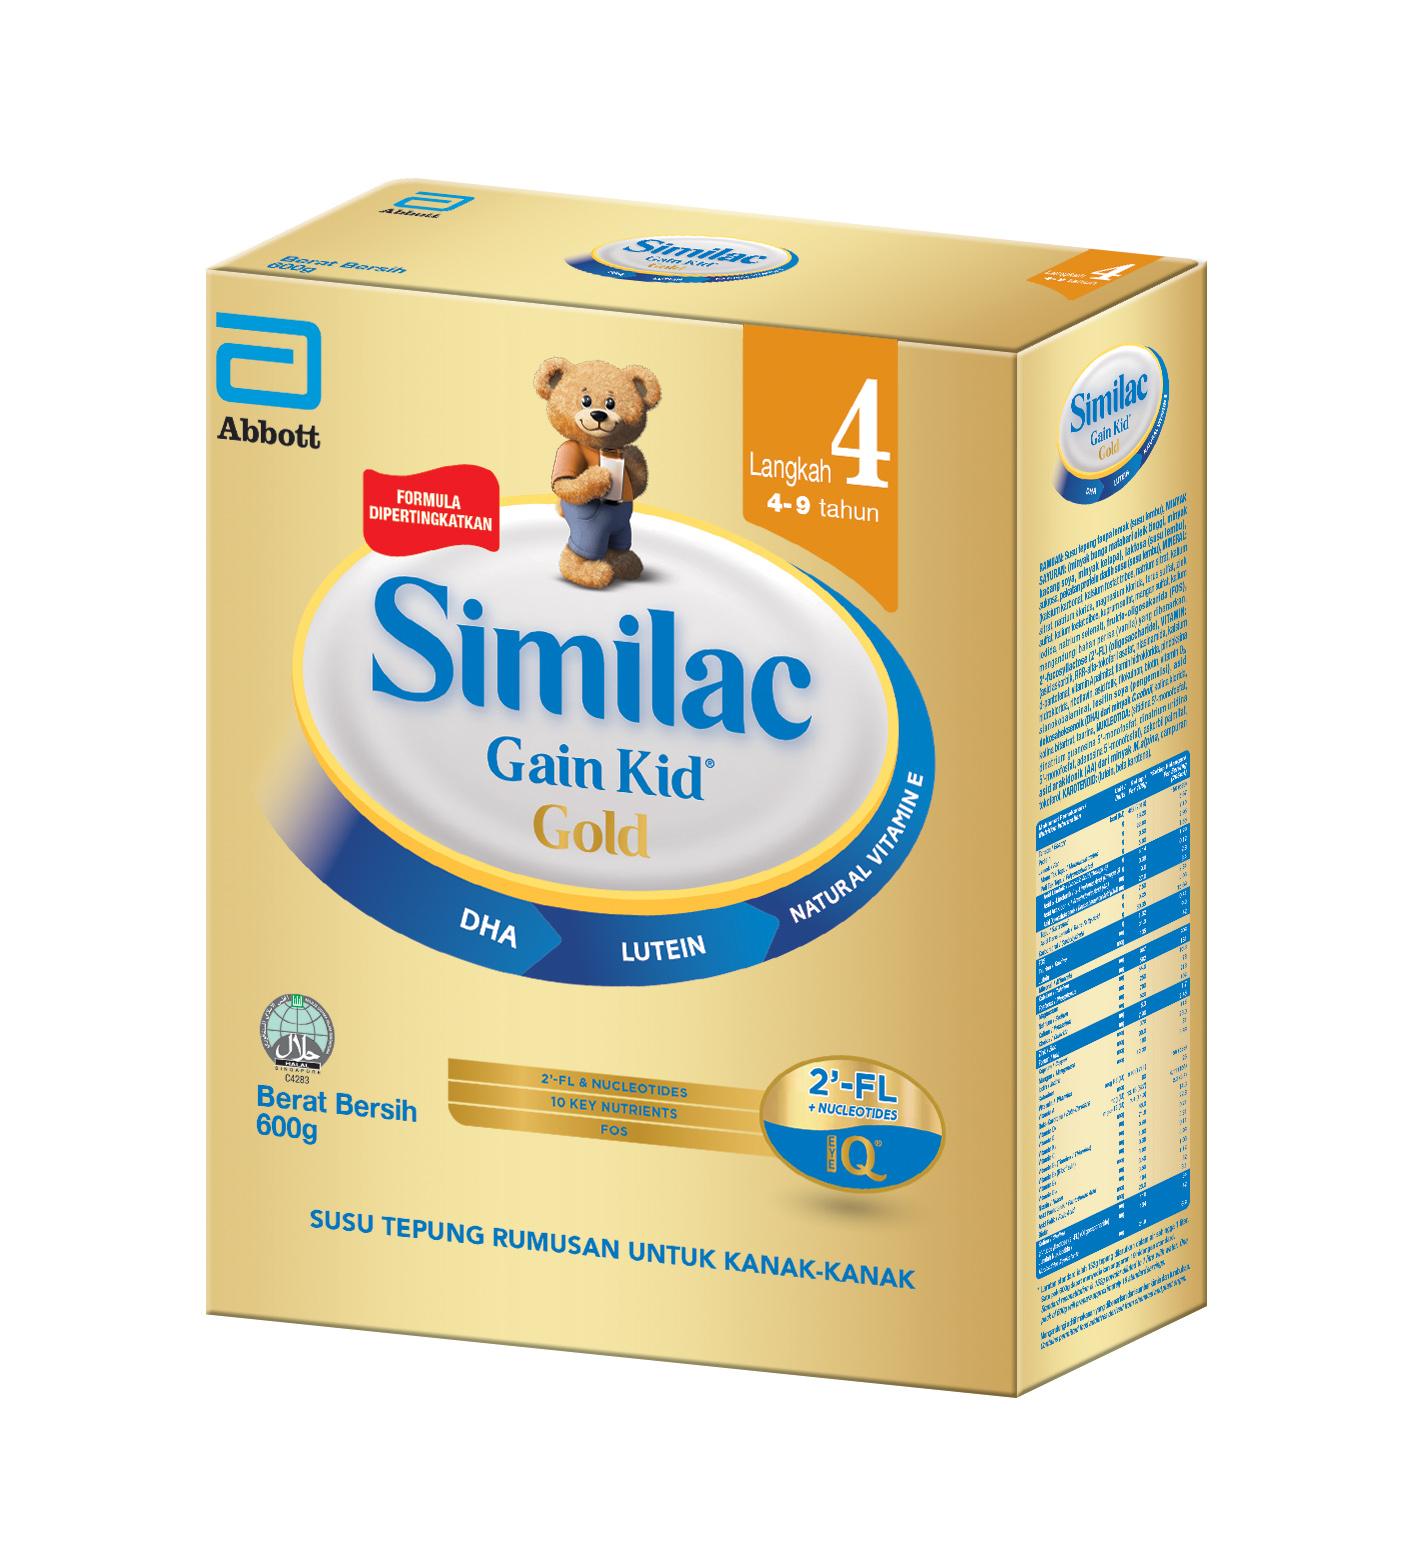 similac product